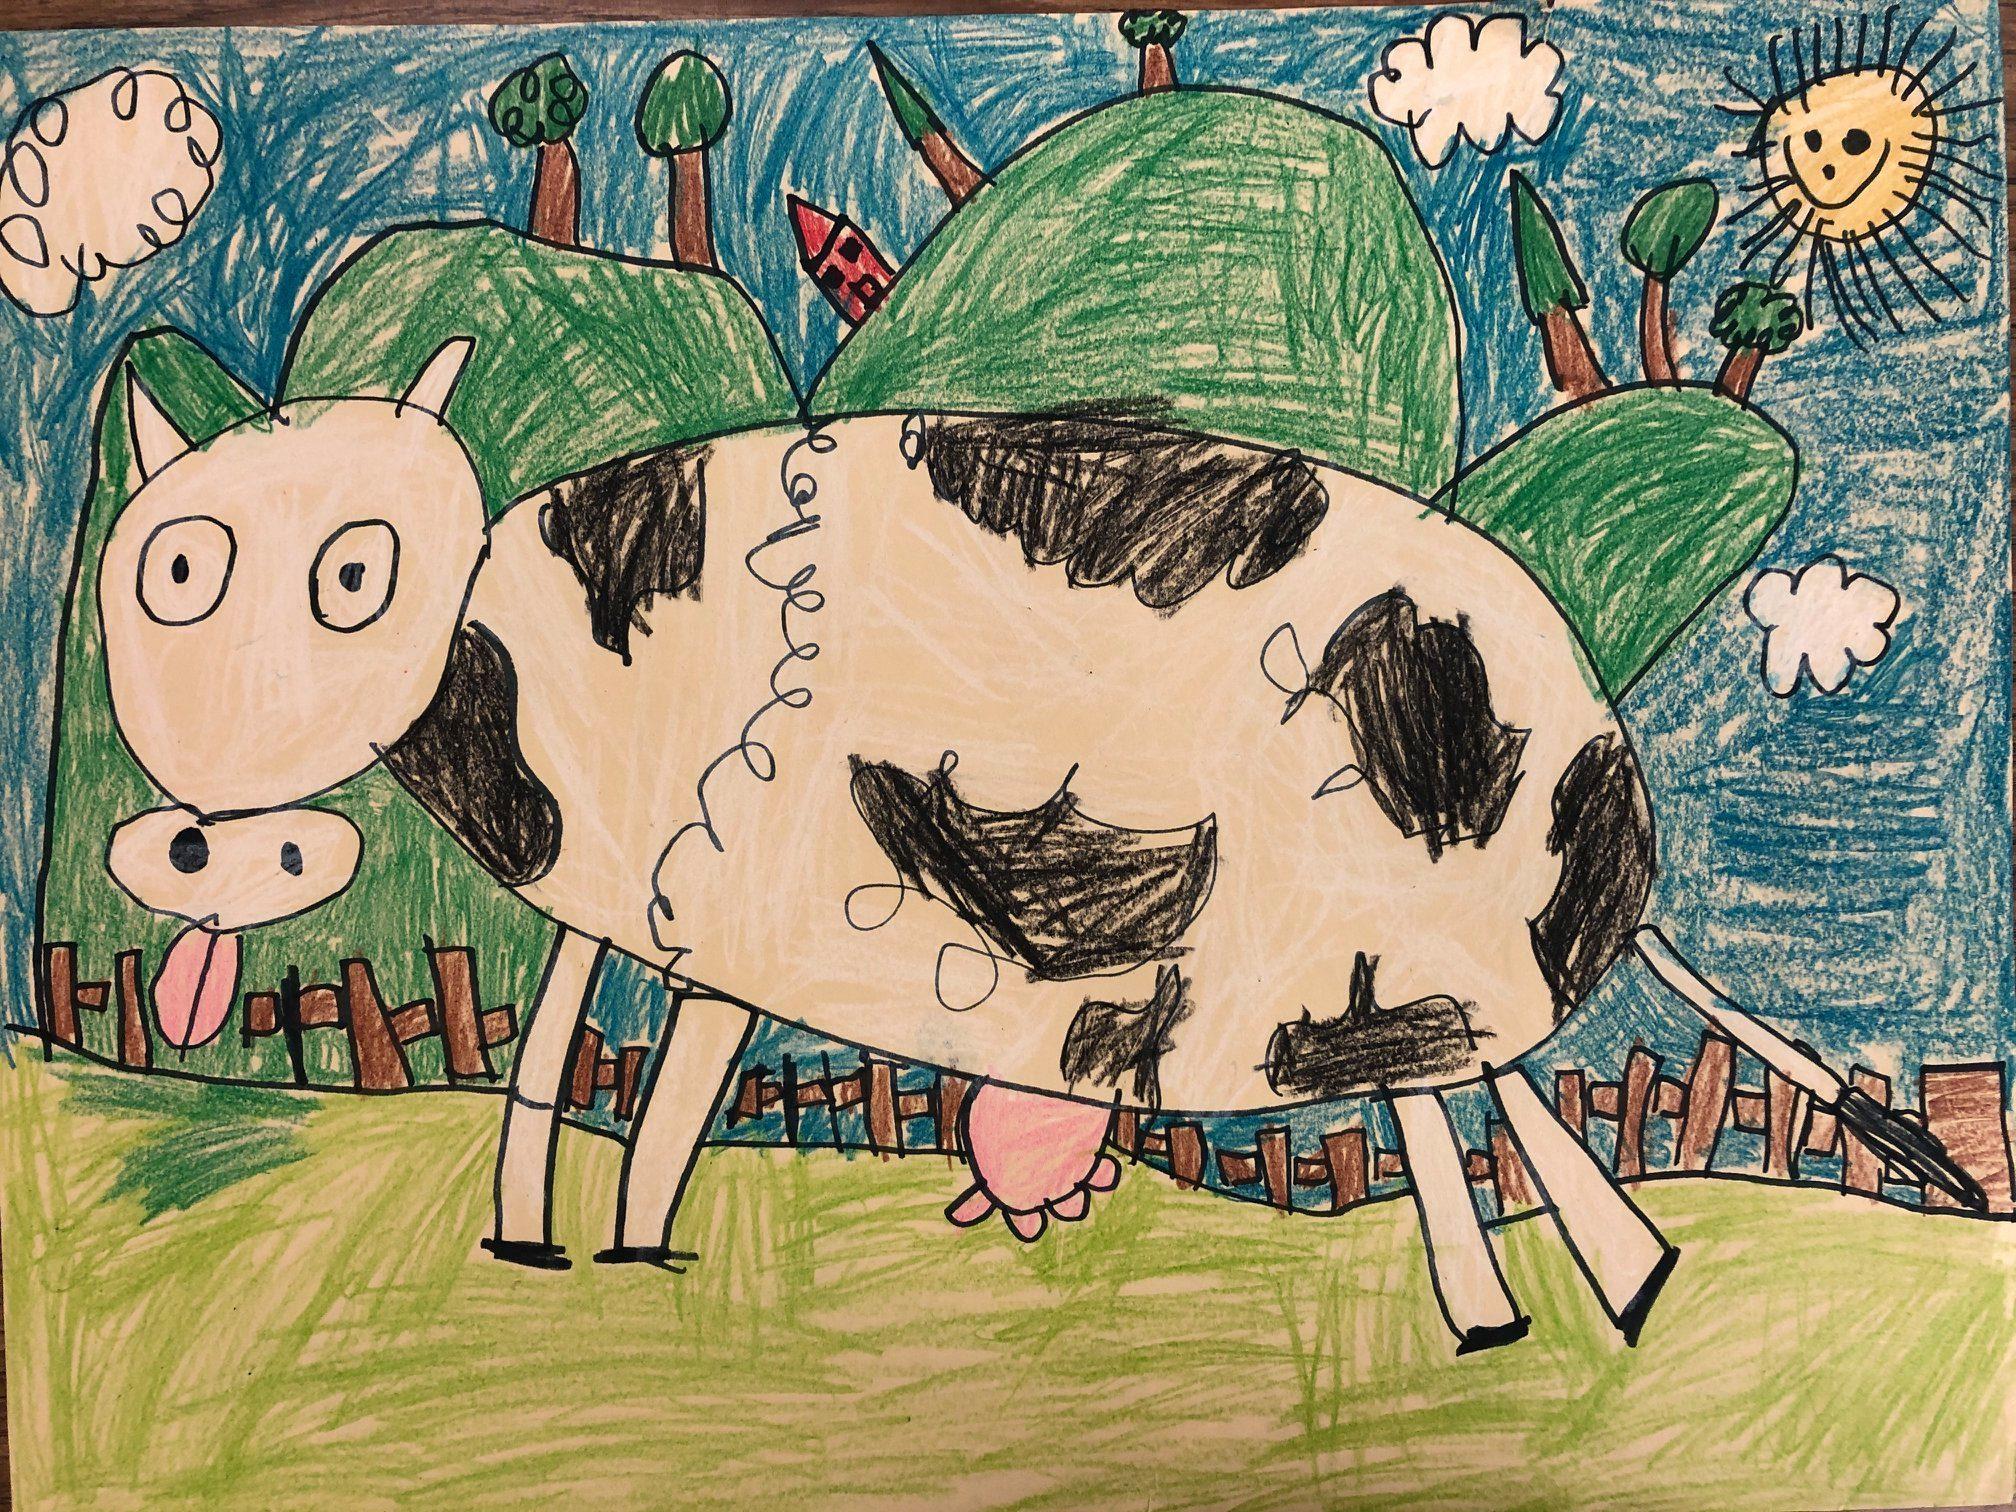 Sophia K, Vance Elementary School, GRADE K, Paper and Crayon, Mr. Segarra